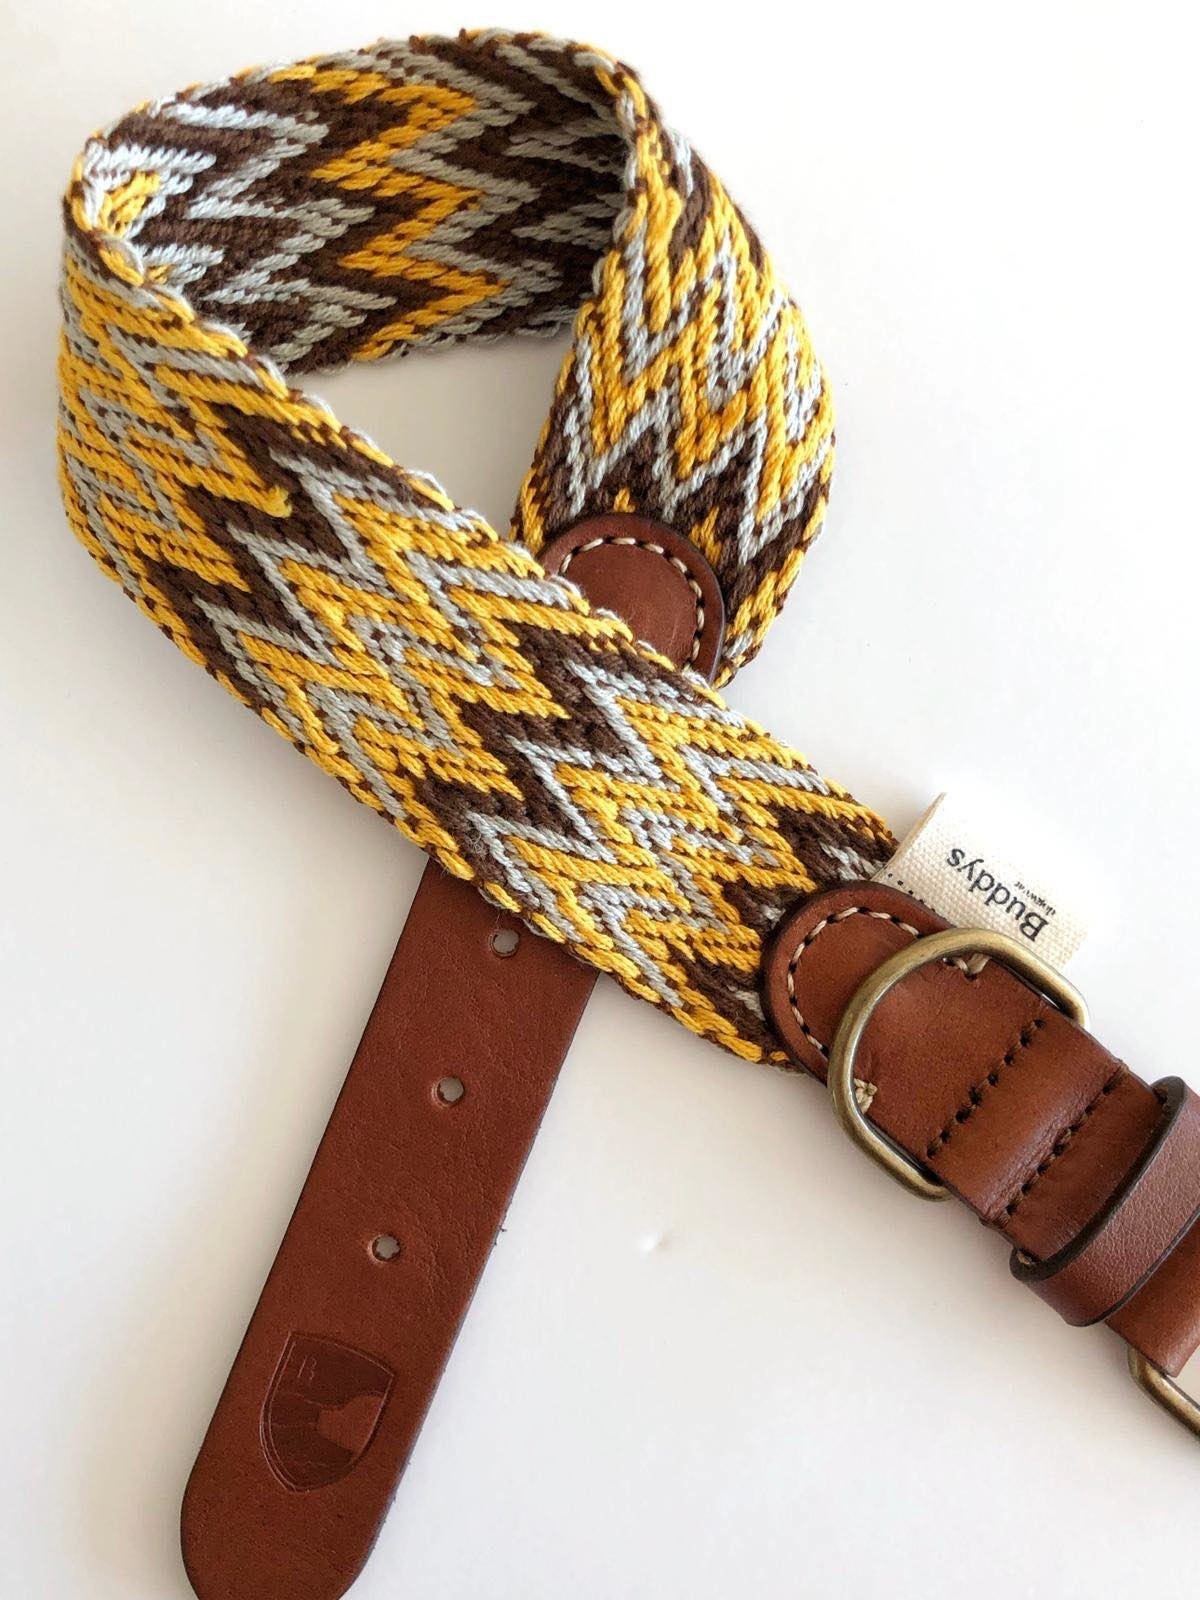 Buddy's Golden Halsband